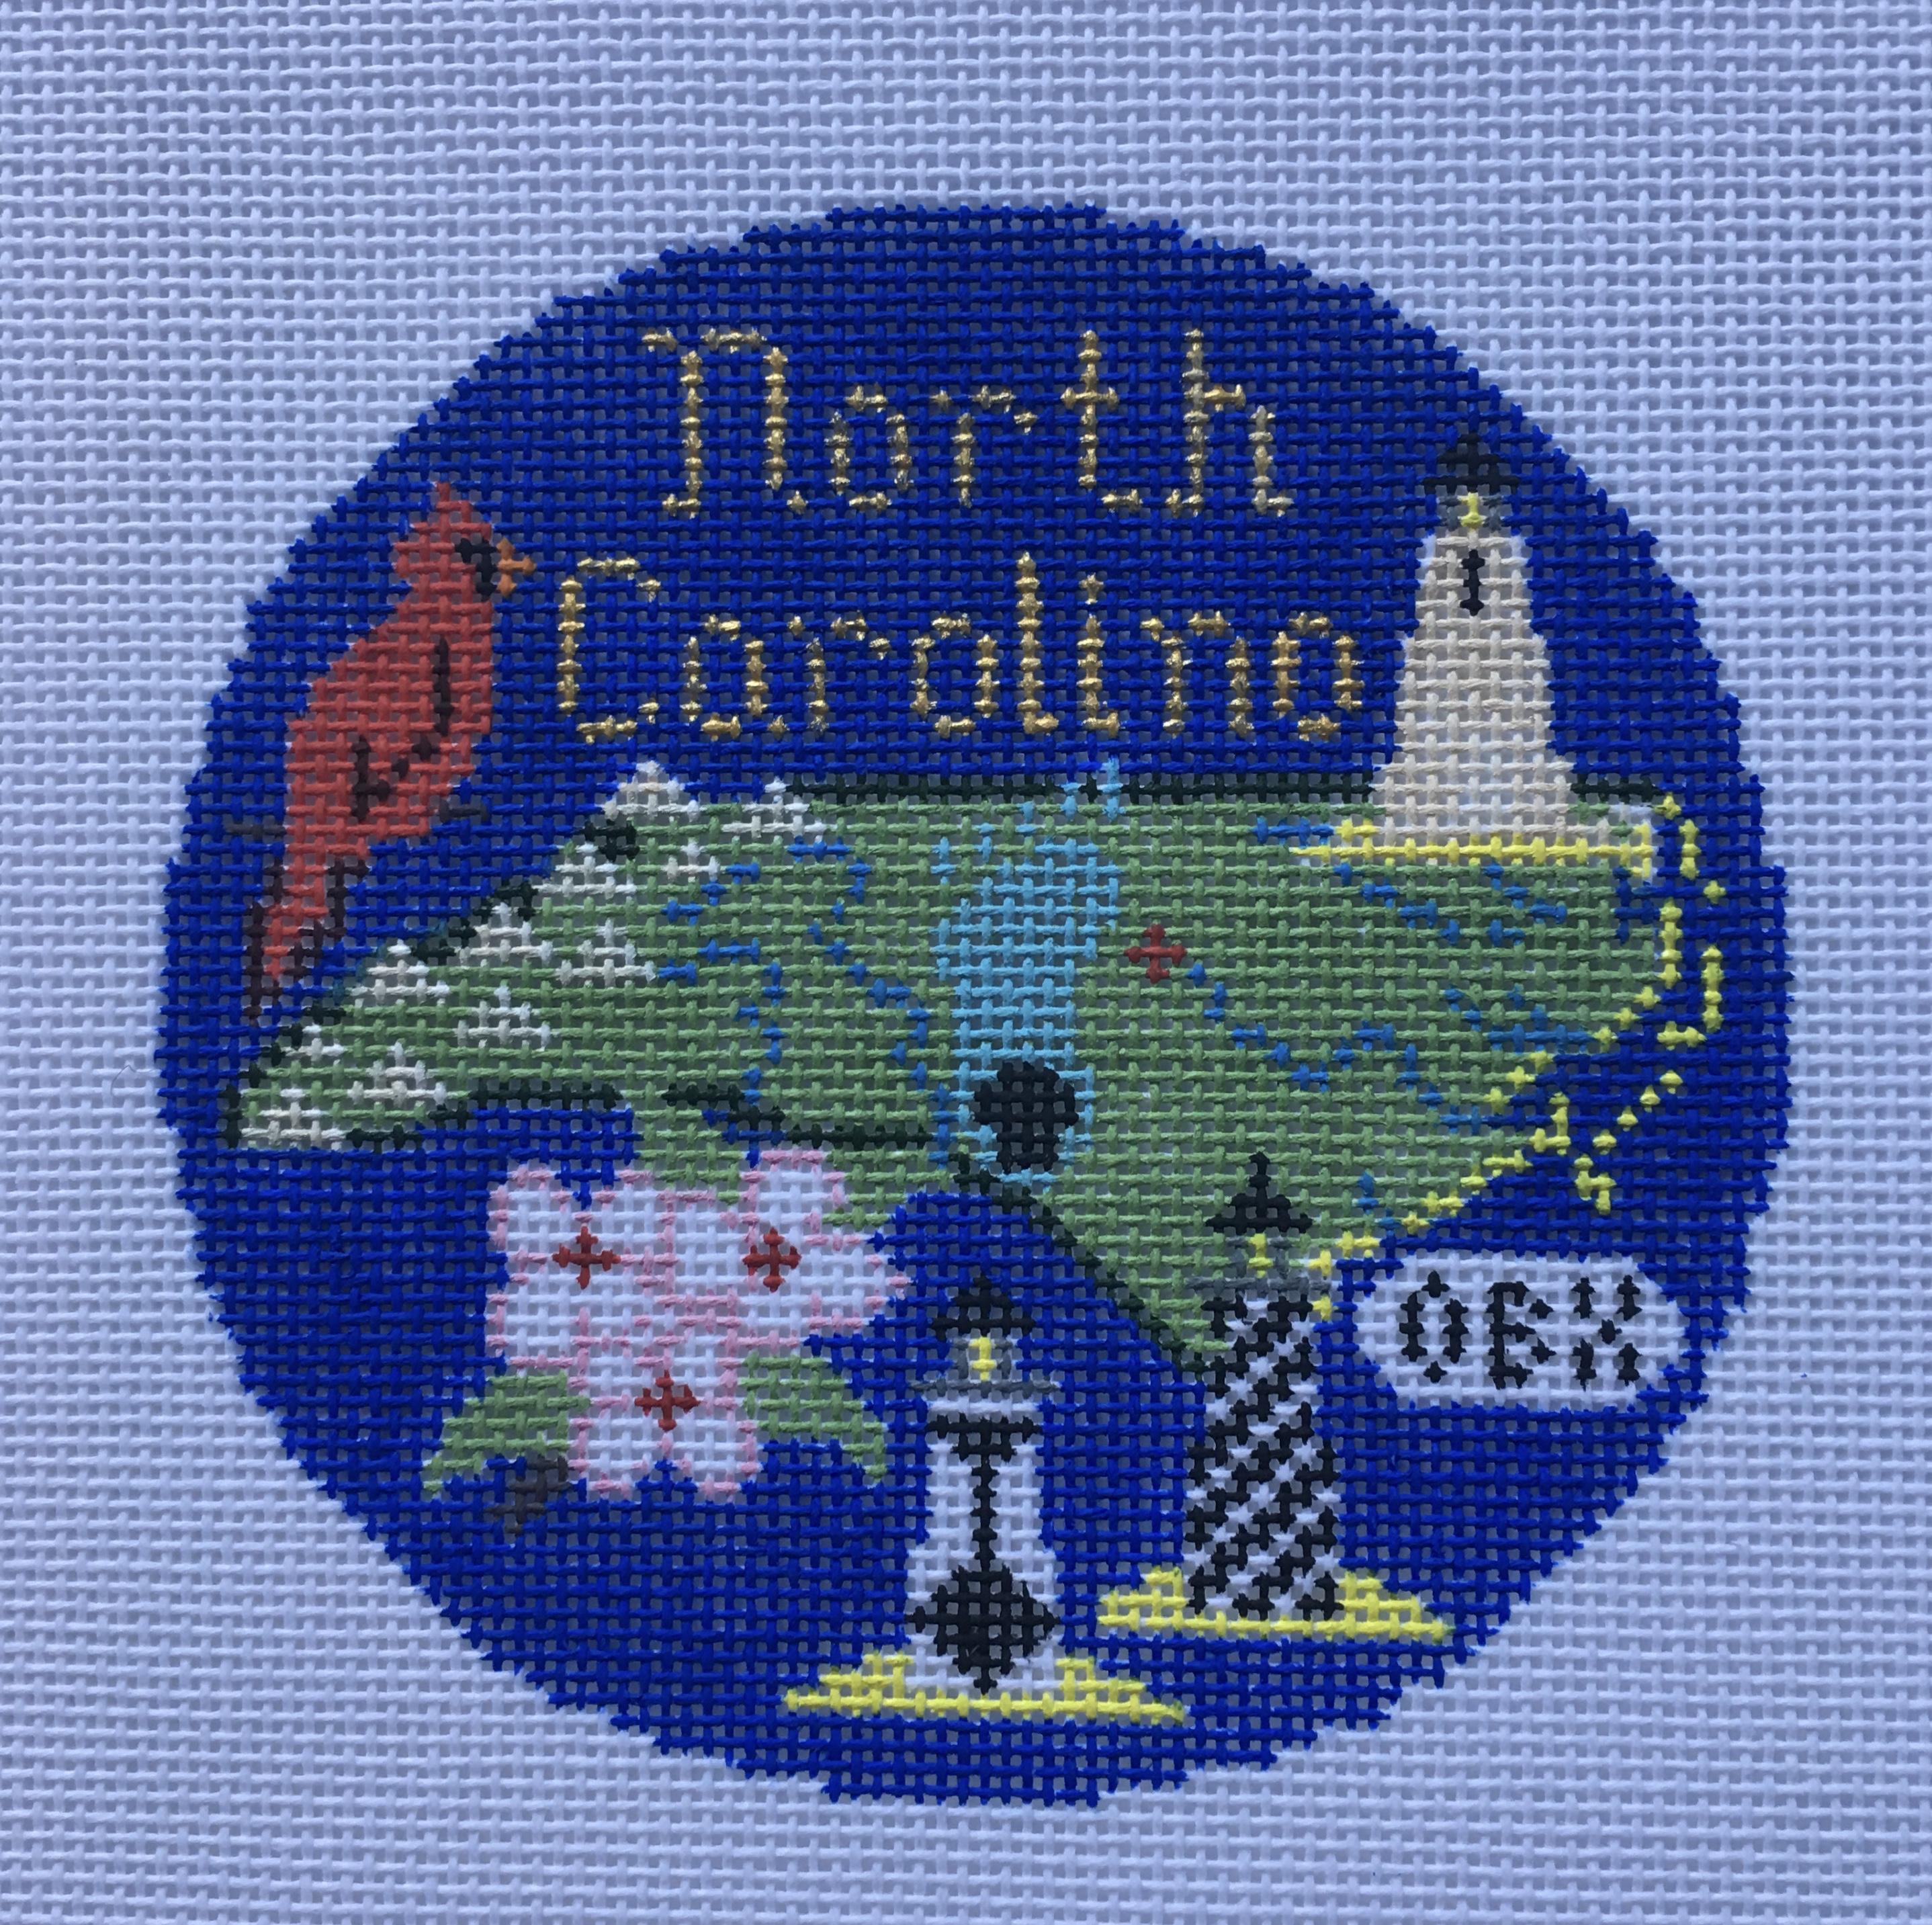 Travel Round - North Carolina by Silver Needle